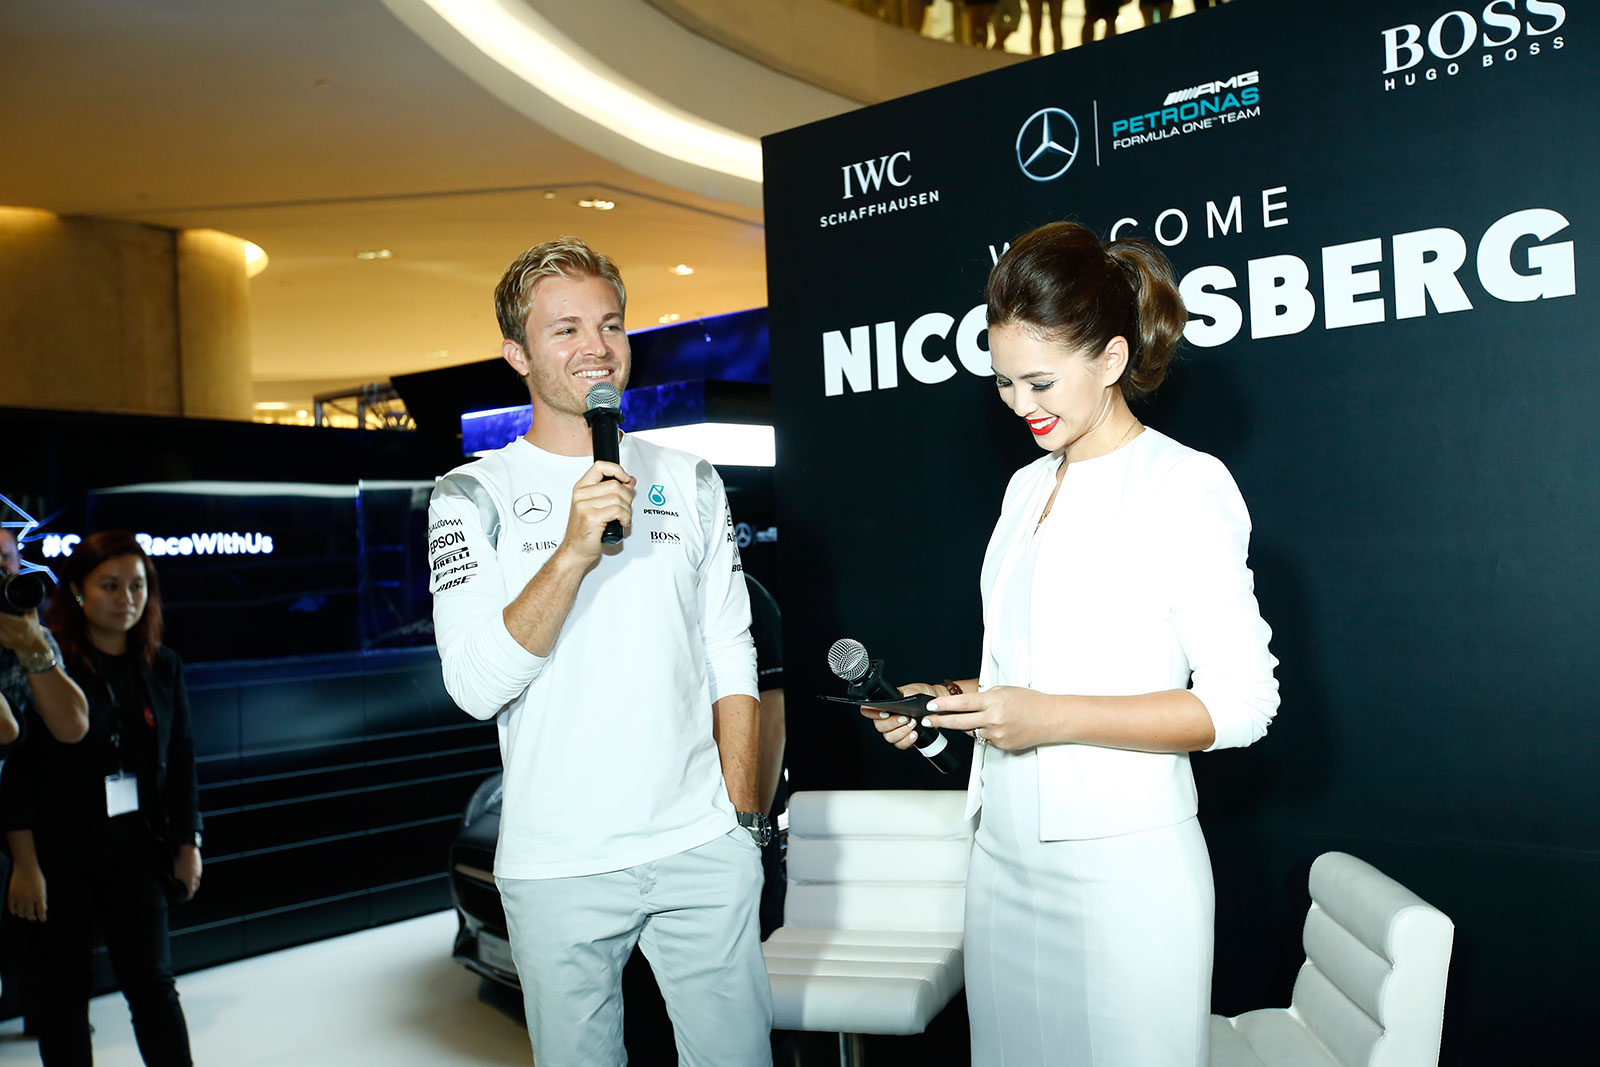 IWC Singapore Grand Prix 2016 Nico Rosberg 1